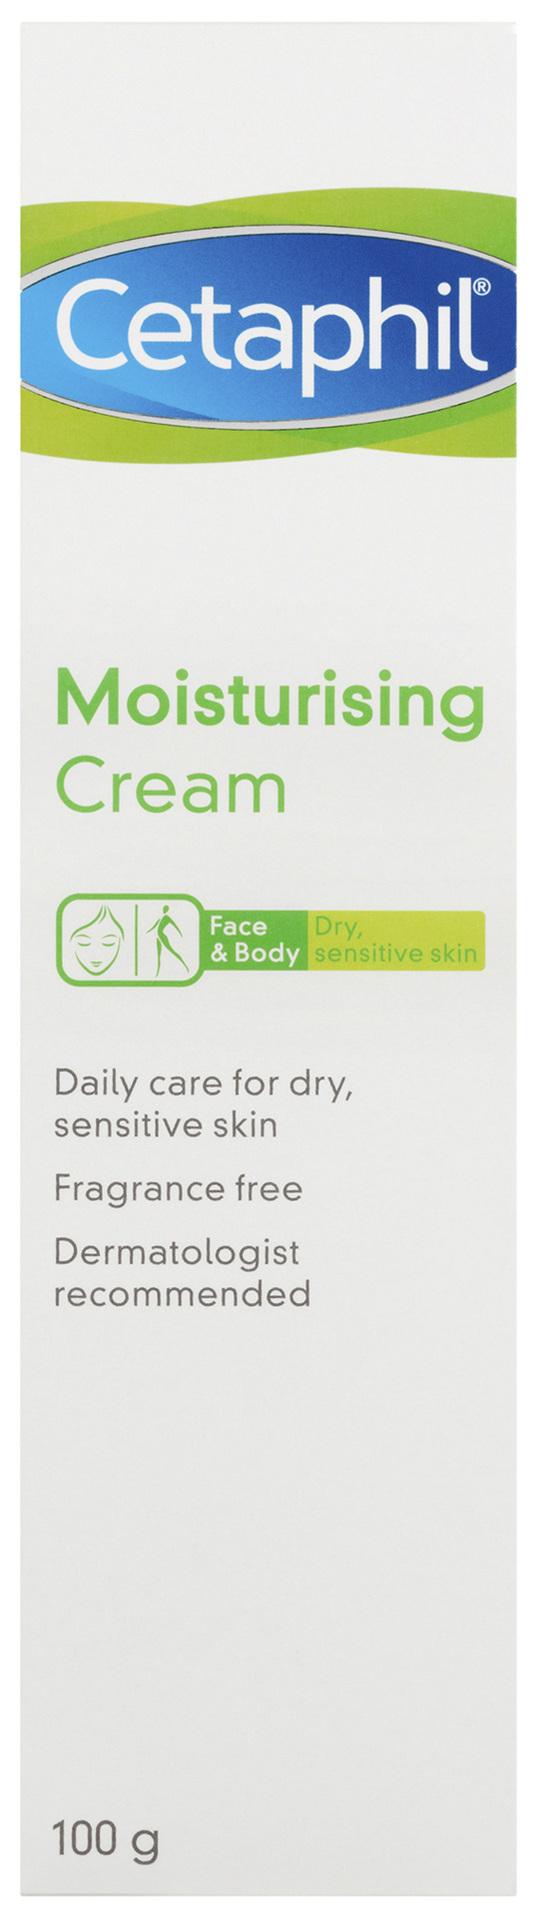 Cetaphil Moisturising Cream 100g, Rich Hydrating Moisturiser